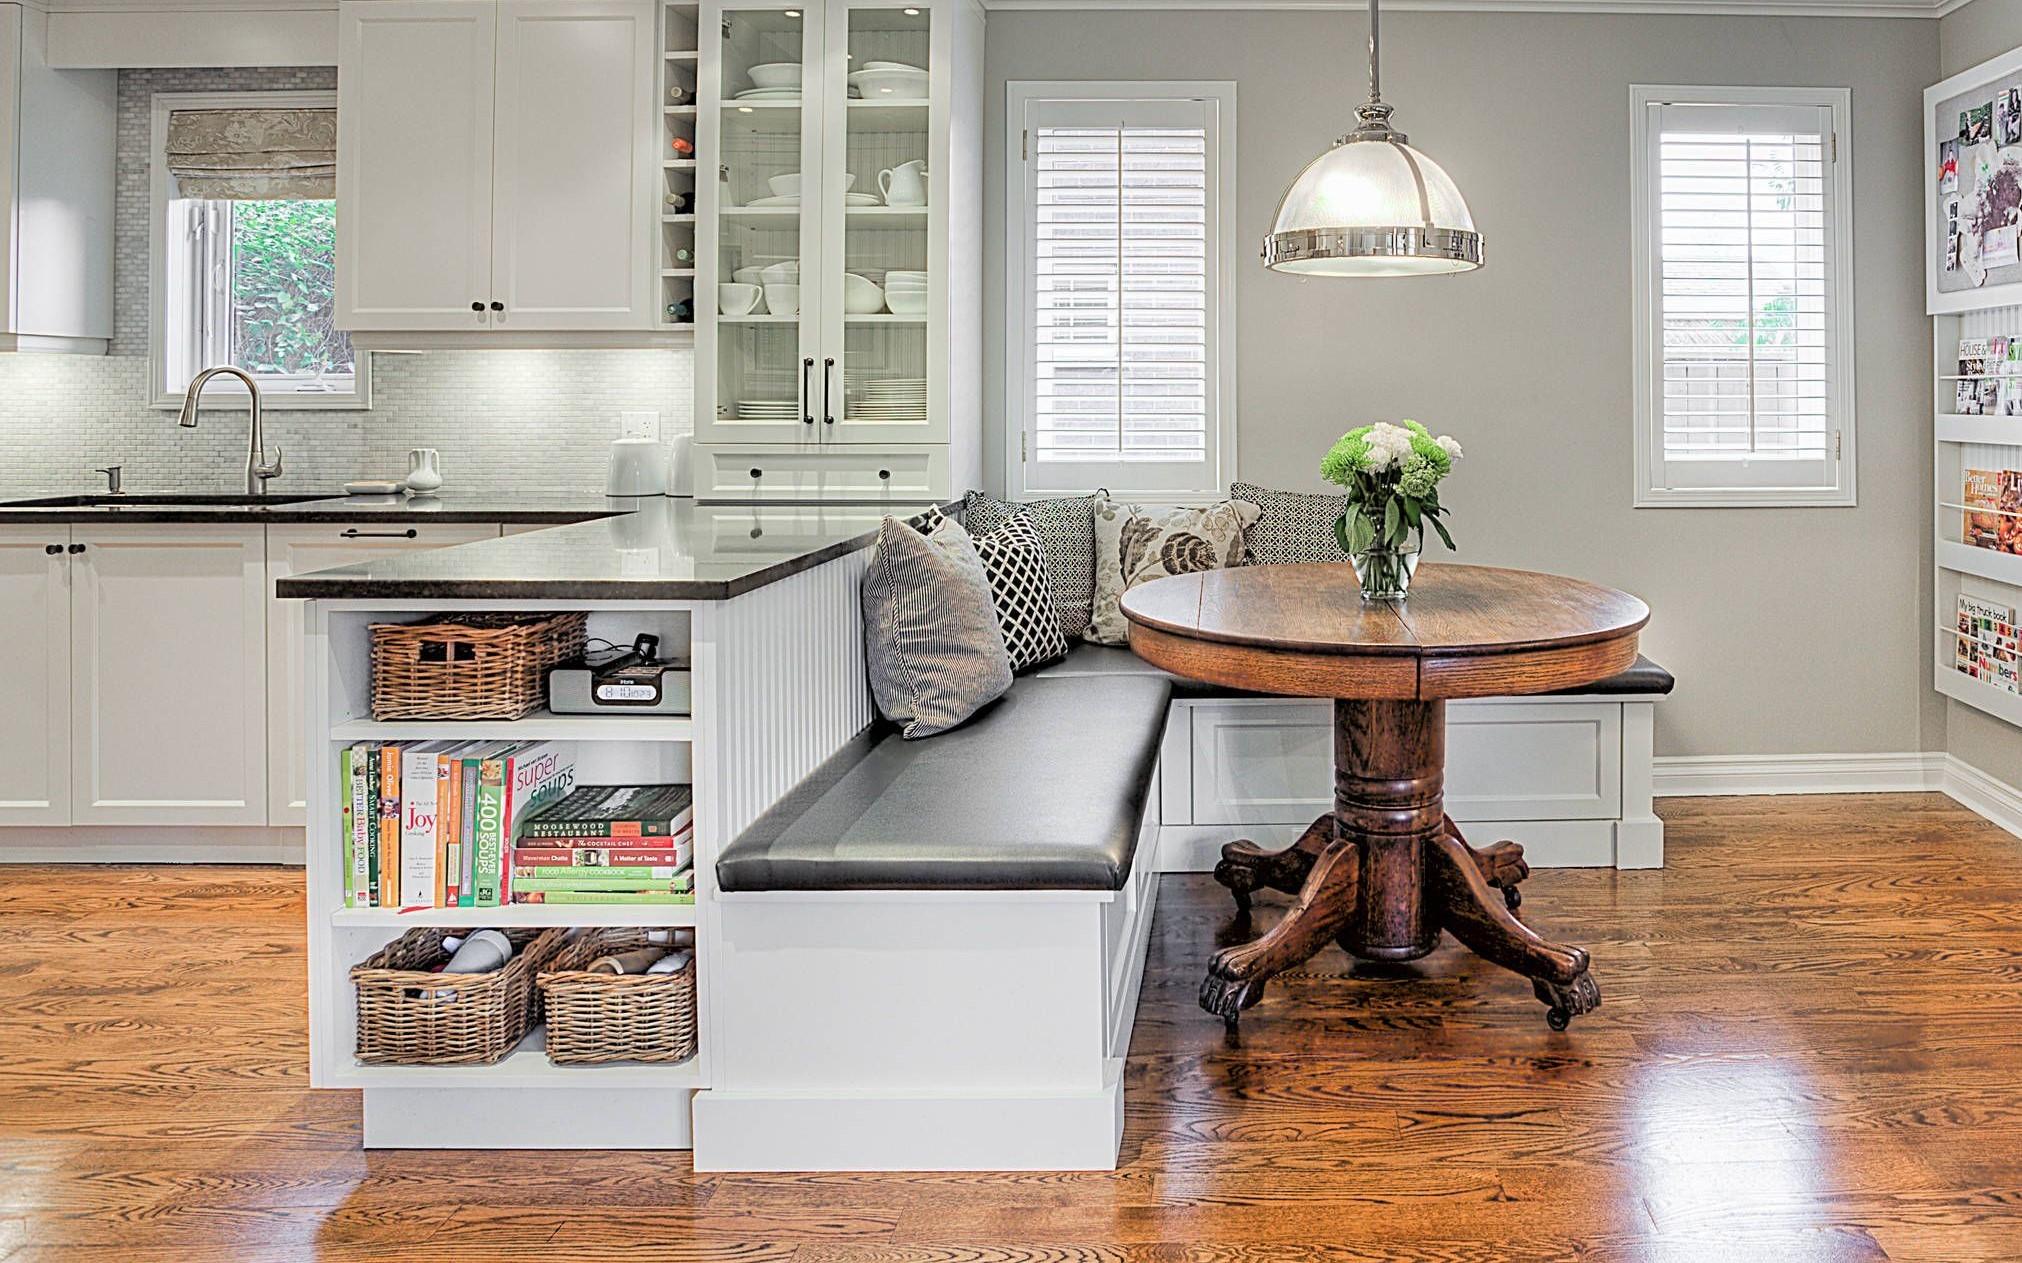 диван кушетка для кухни идеи фото